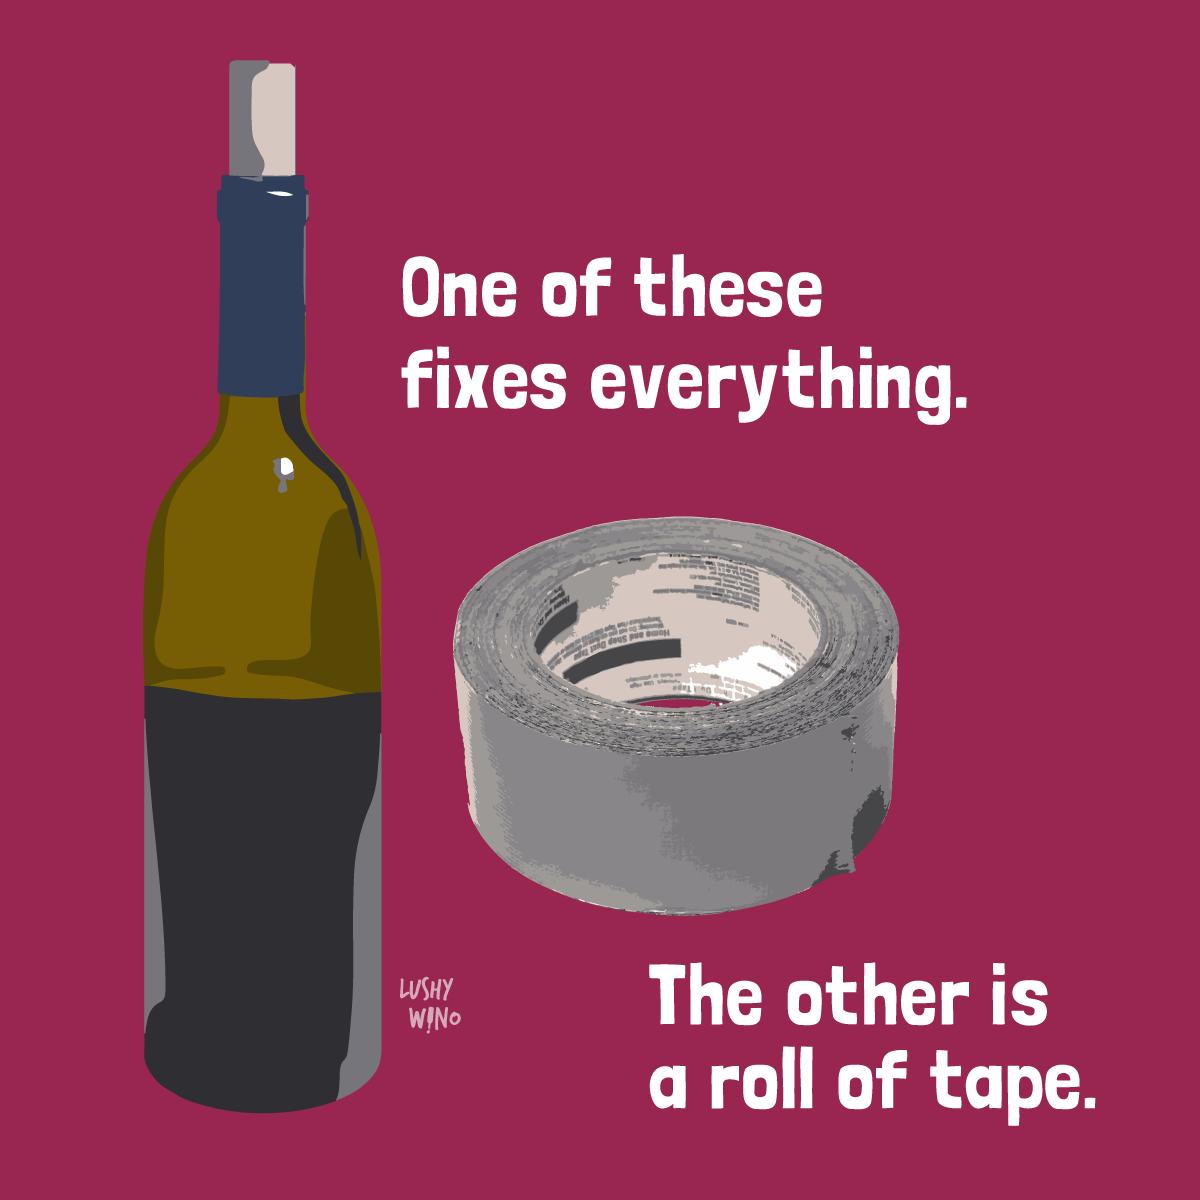 Funny wine quotes & memes Wine meme, Wine quotes funny